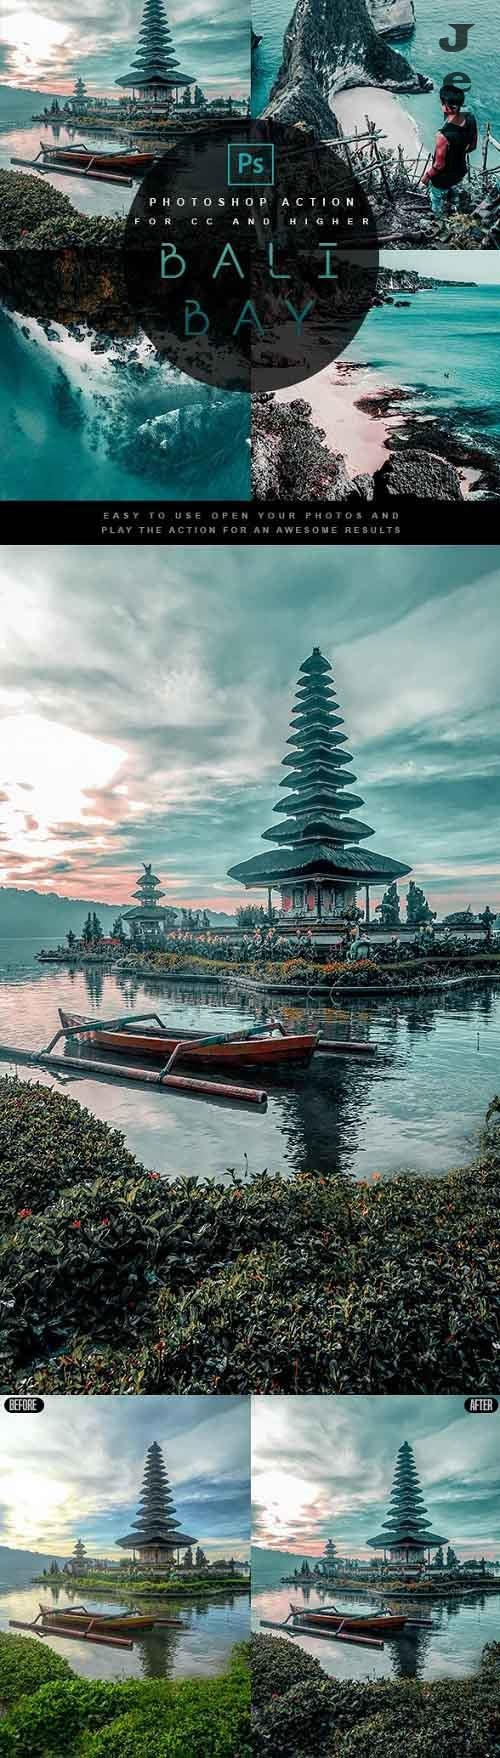 GraphicRiver - Bali Bay - PHSP Action 28295208